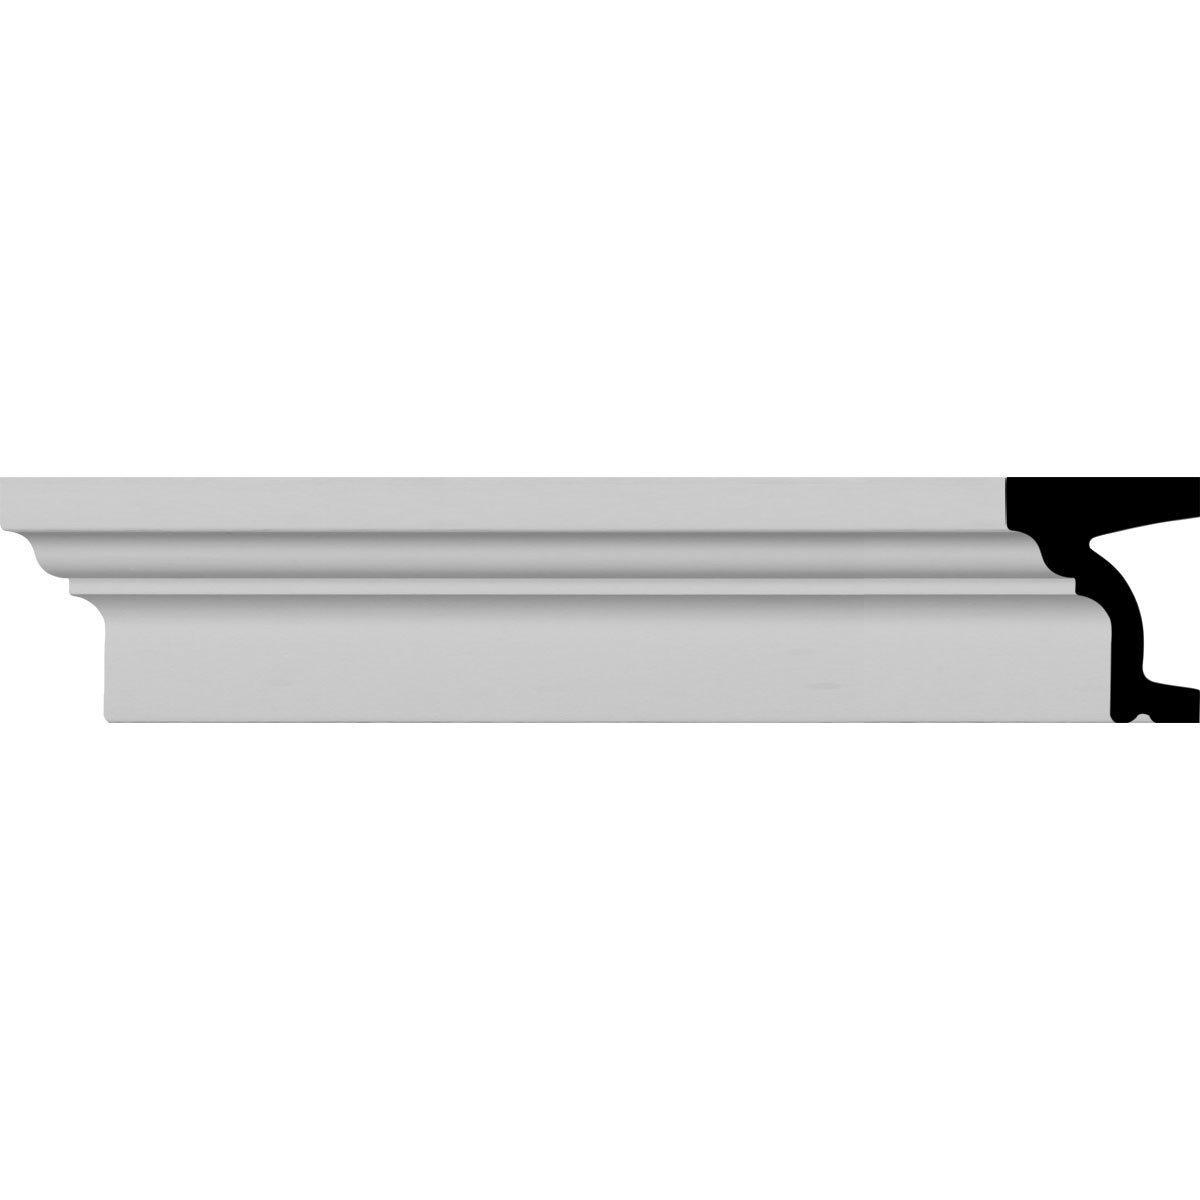 Ekena Millwork MLD05X04ST-CASE-8 5 inch H x 4 inch P x 94 1/2 inch L Standard Moulding (8-Pack),